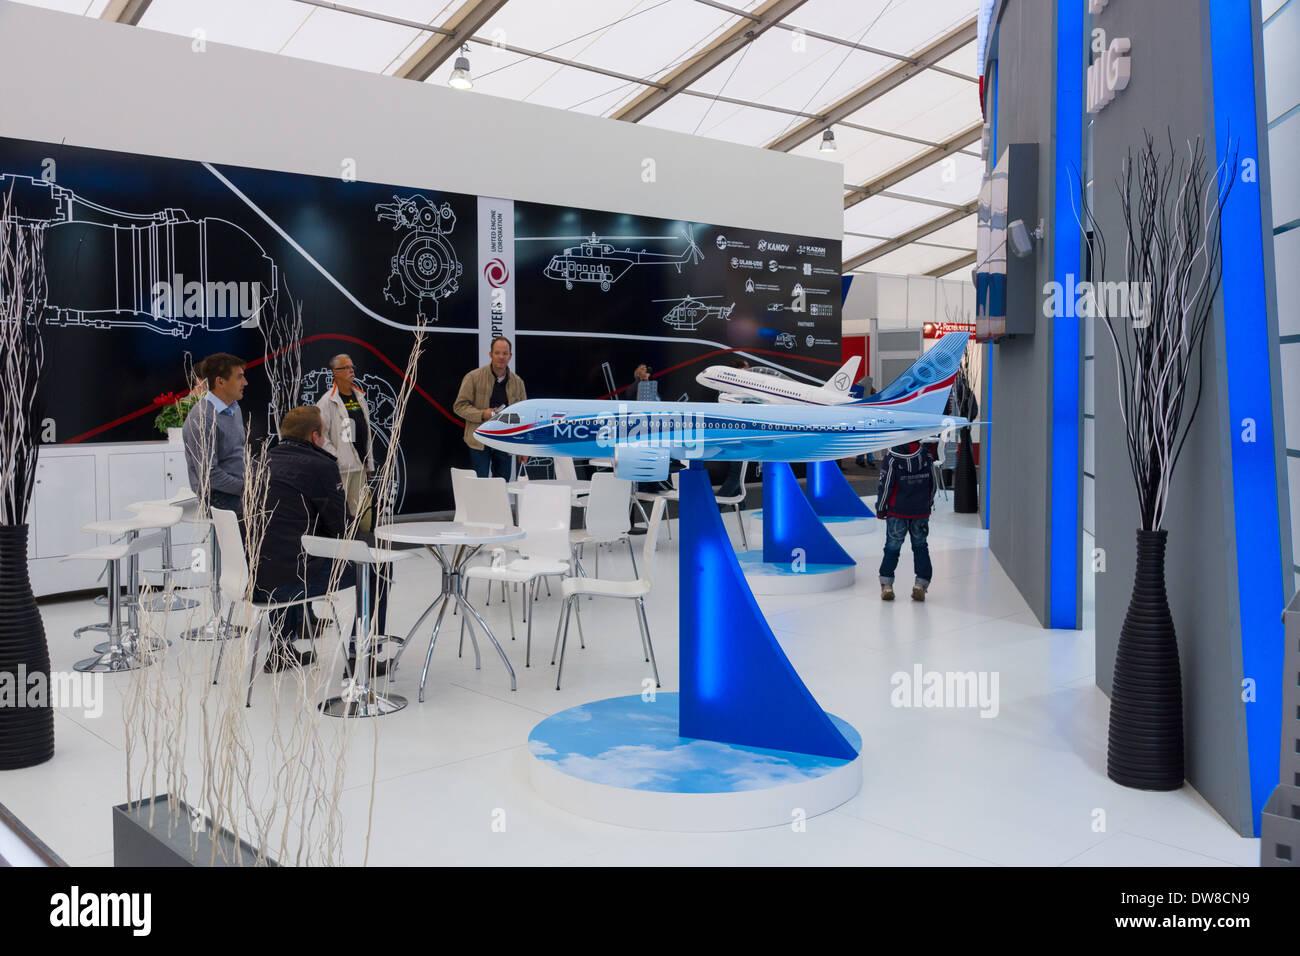 ILA Berlin Air Show 2012. Model of a passenger jet Irkut MS-21. - Stock Image